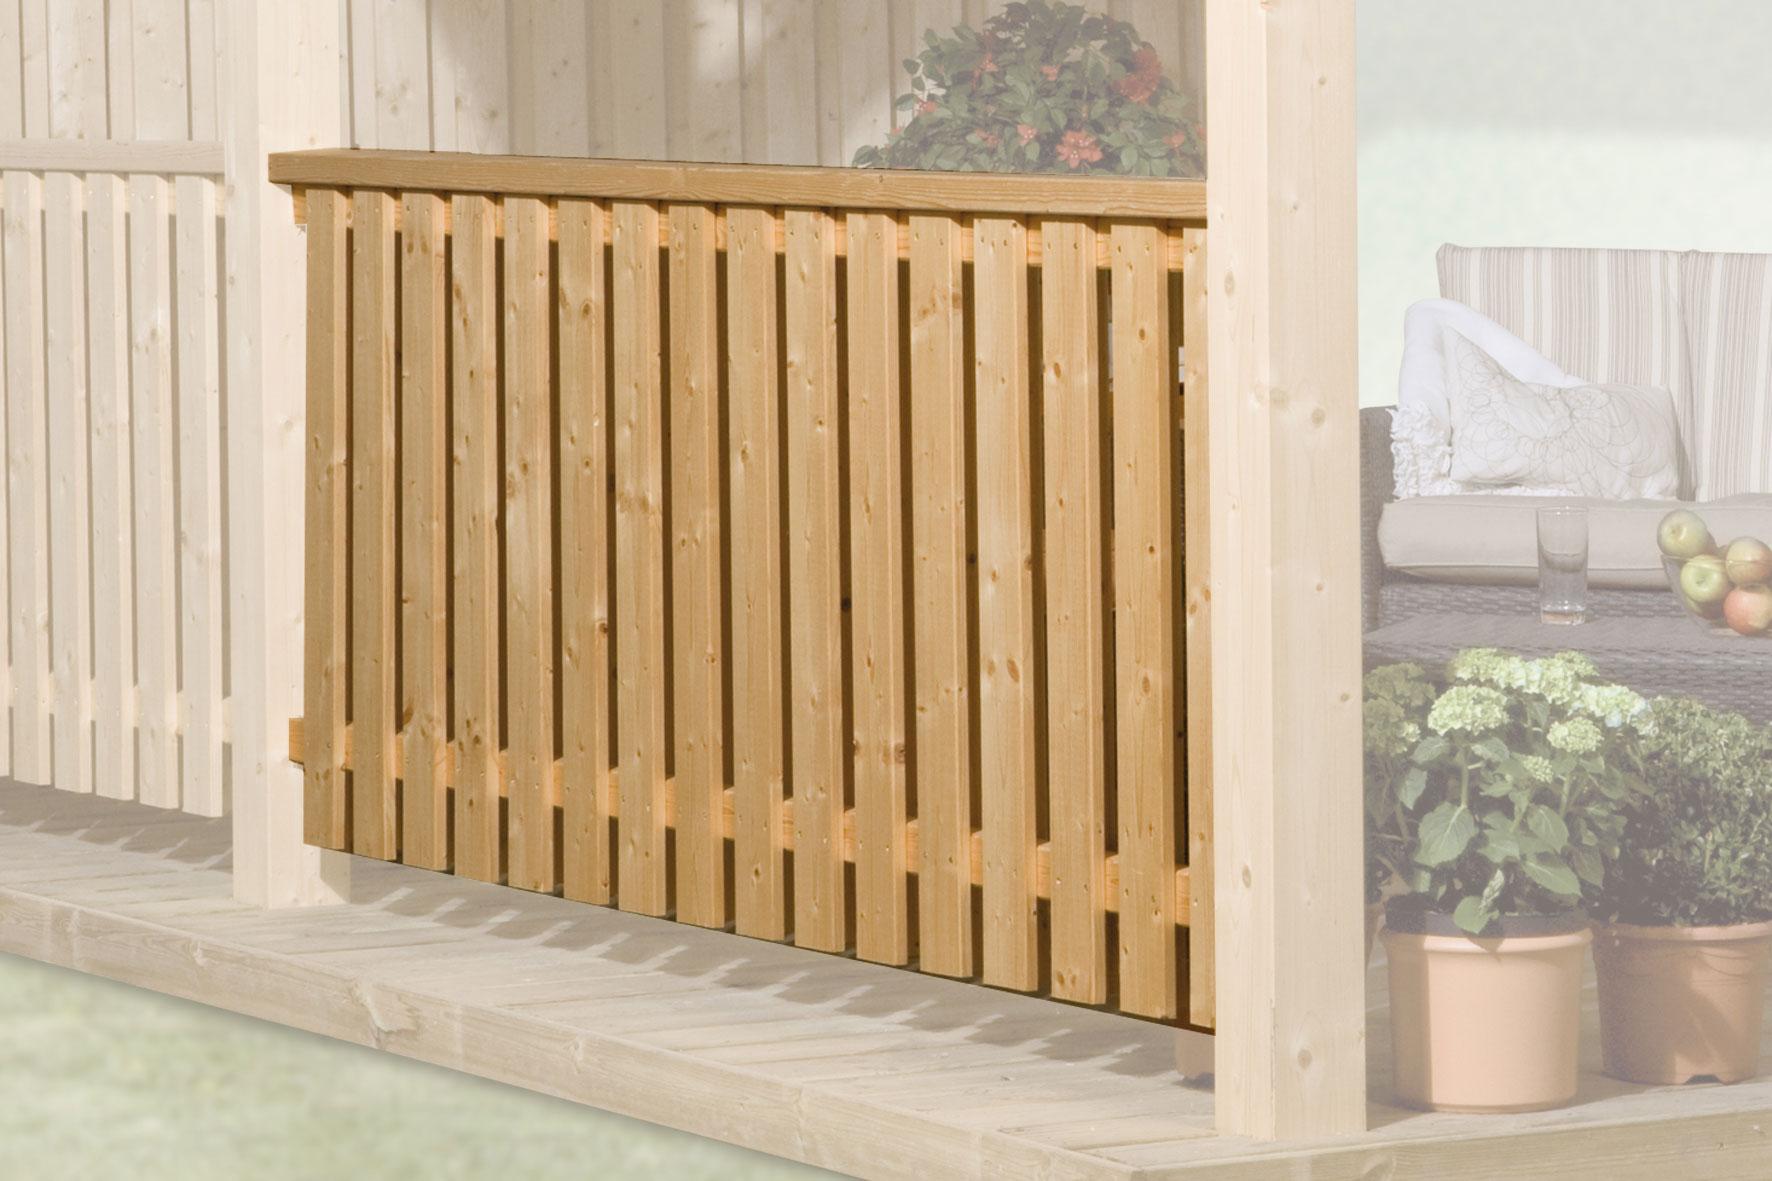 br stungsgel nder f r weka terrassen berdachung aus leimholz bei. Black Bedroom Furniture Sets. Home Design Ideas